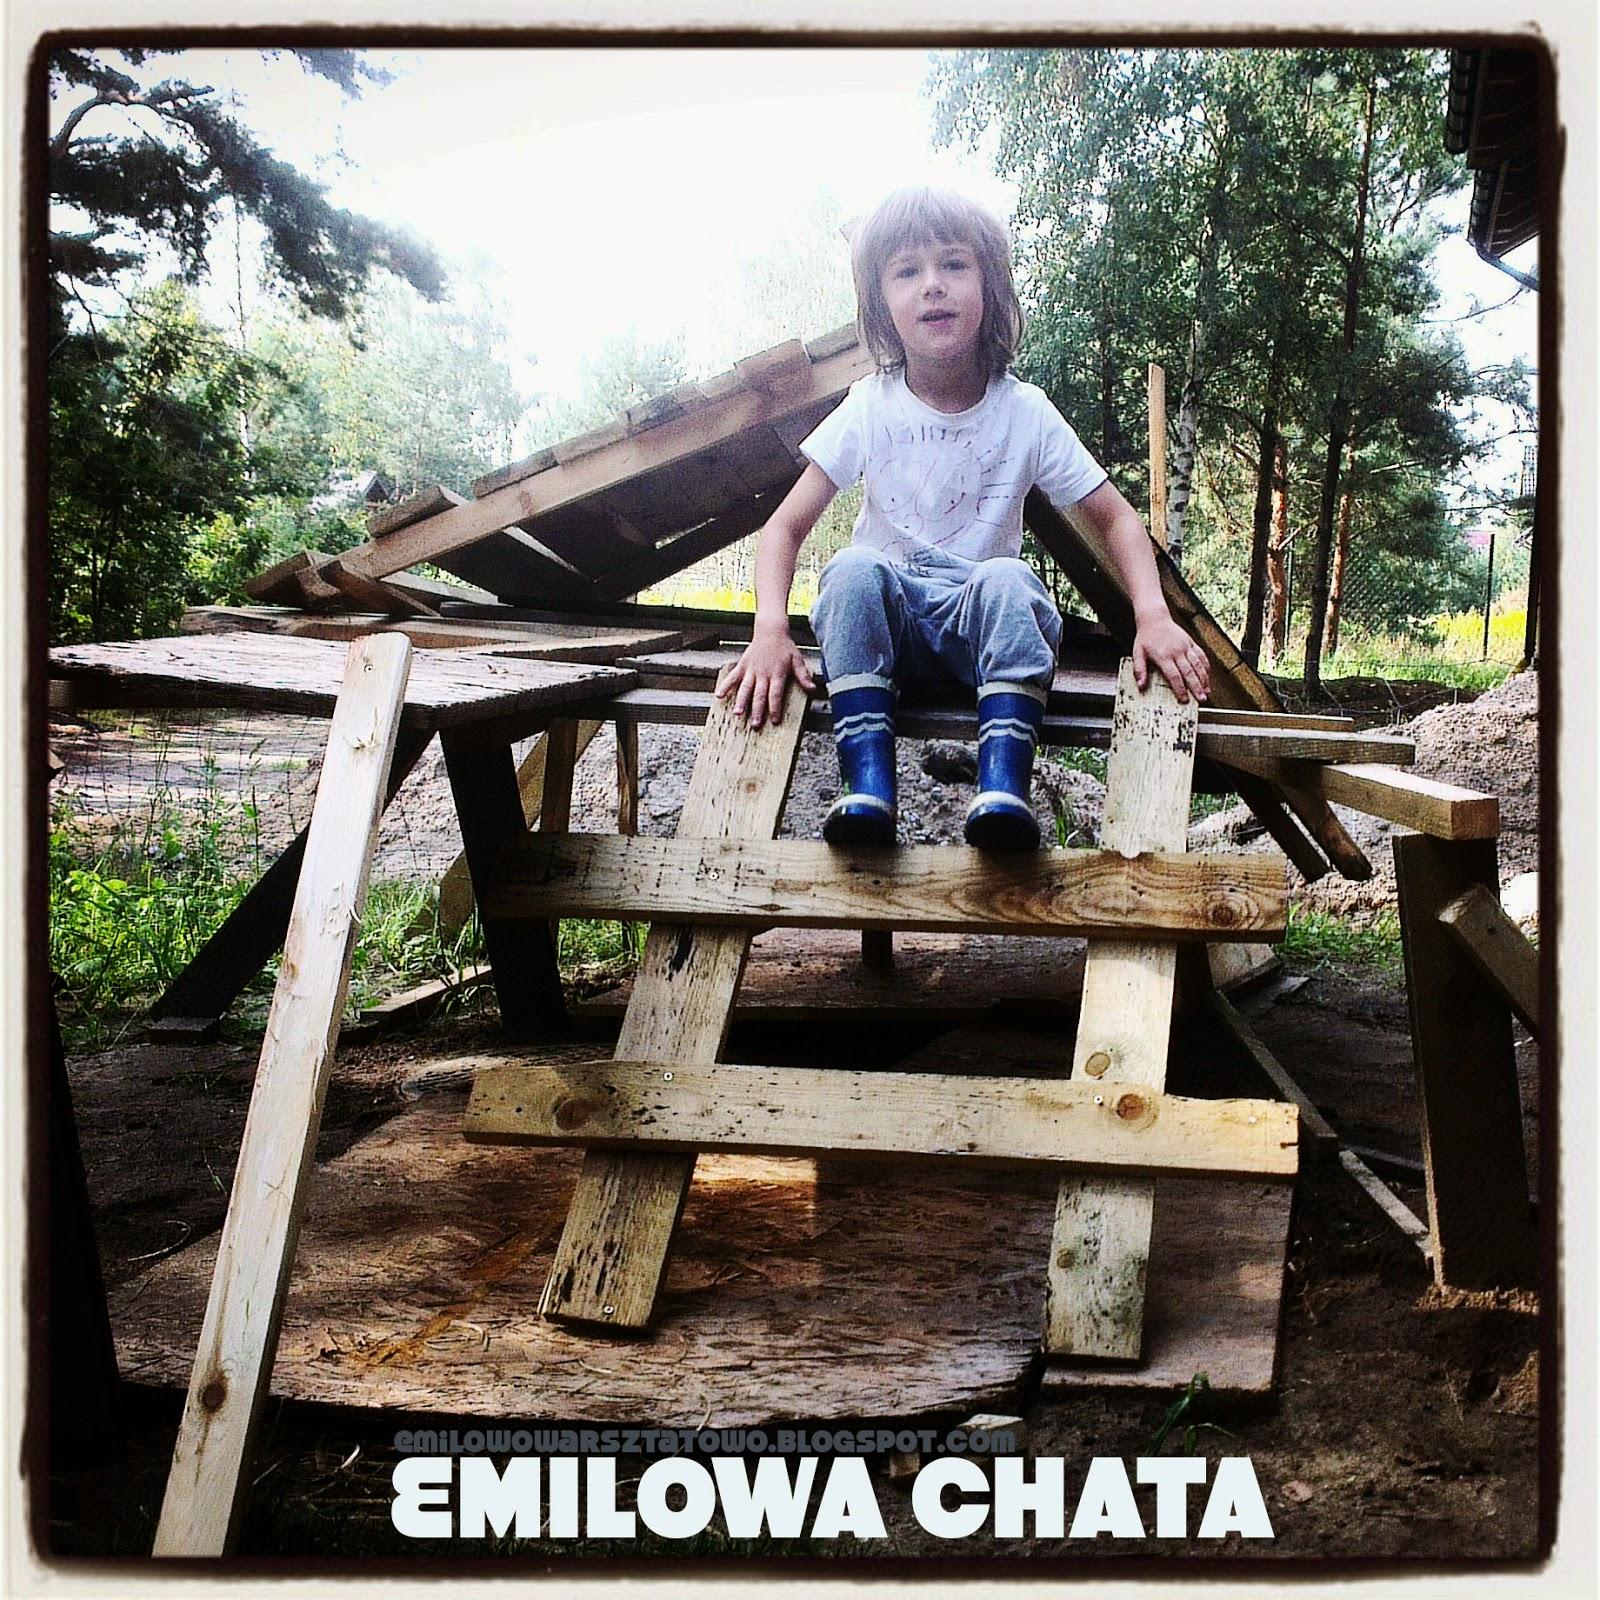 http://emilowowarsztatowo.blogspot.com/2014/08/emilowa-chata.html